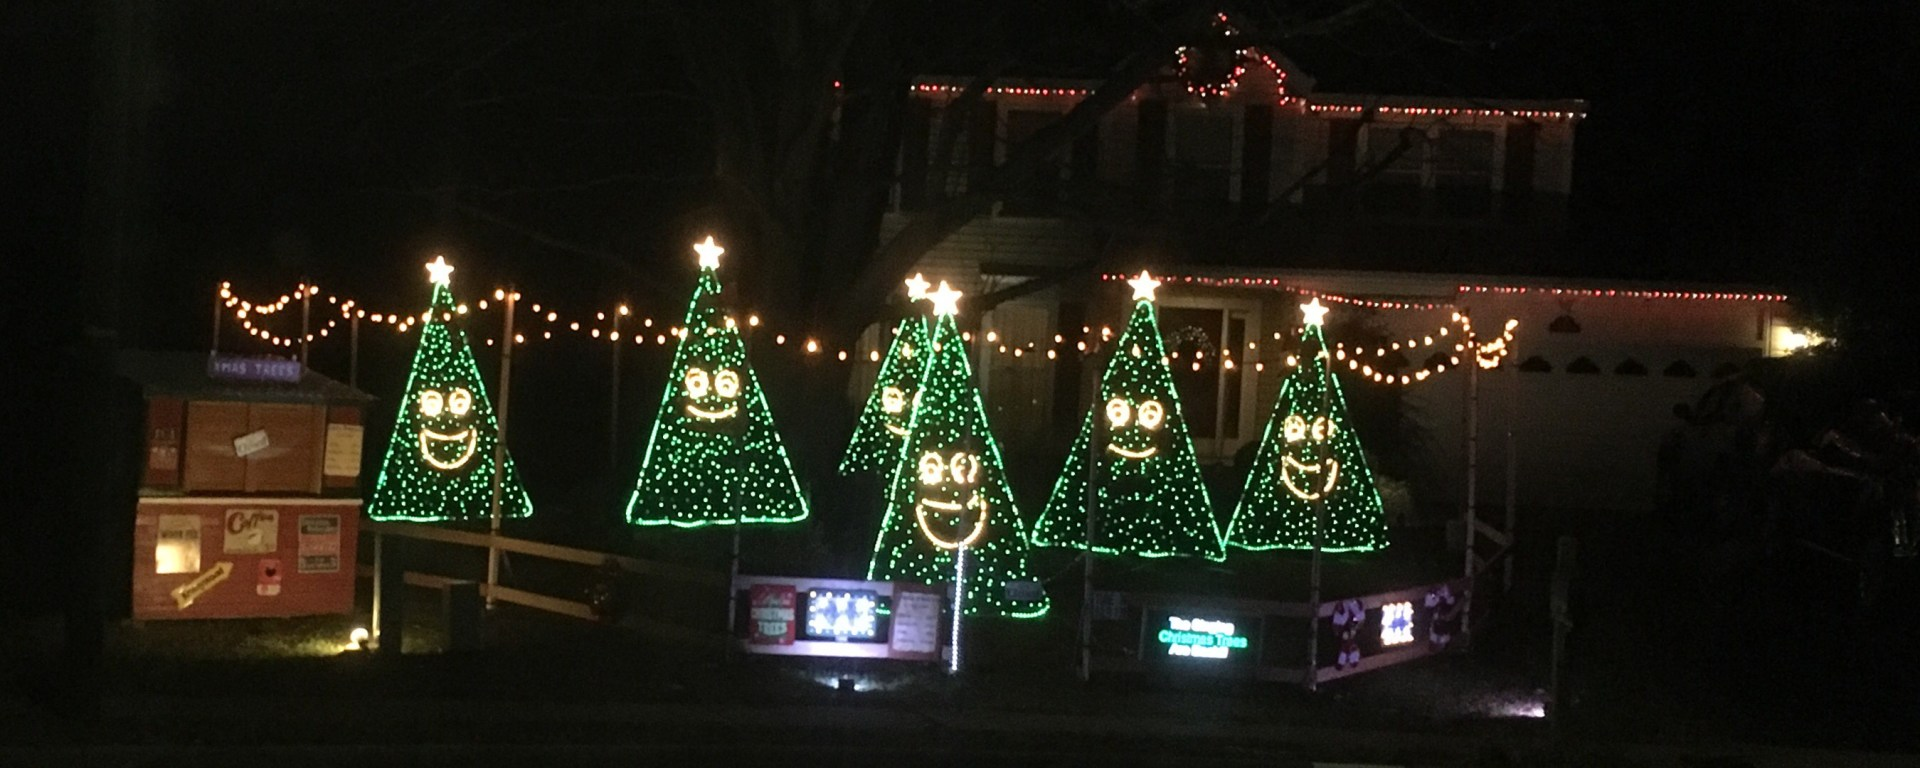 singing christmas trees in manassas city - Singing Christmas Tree Lights